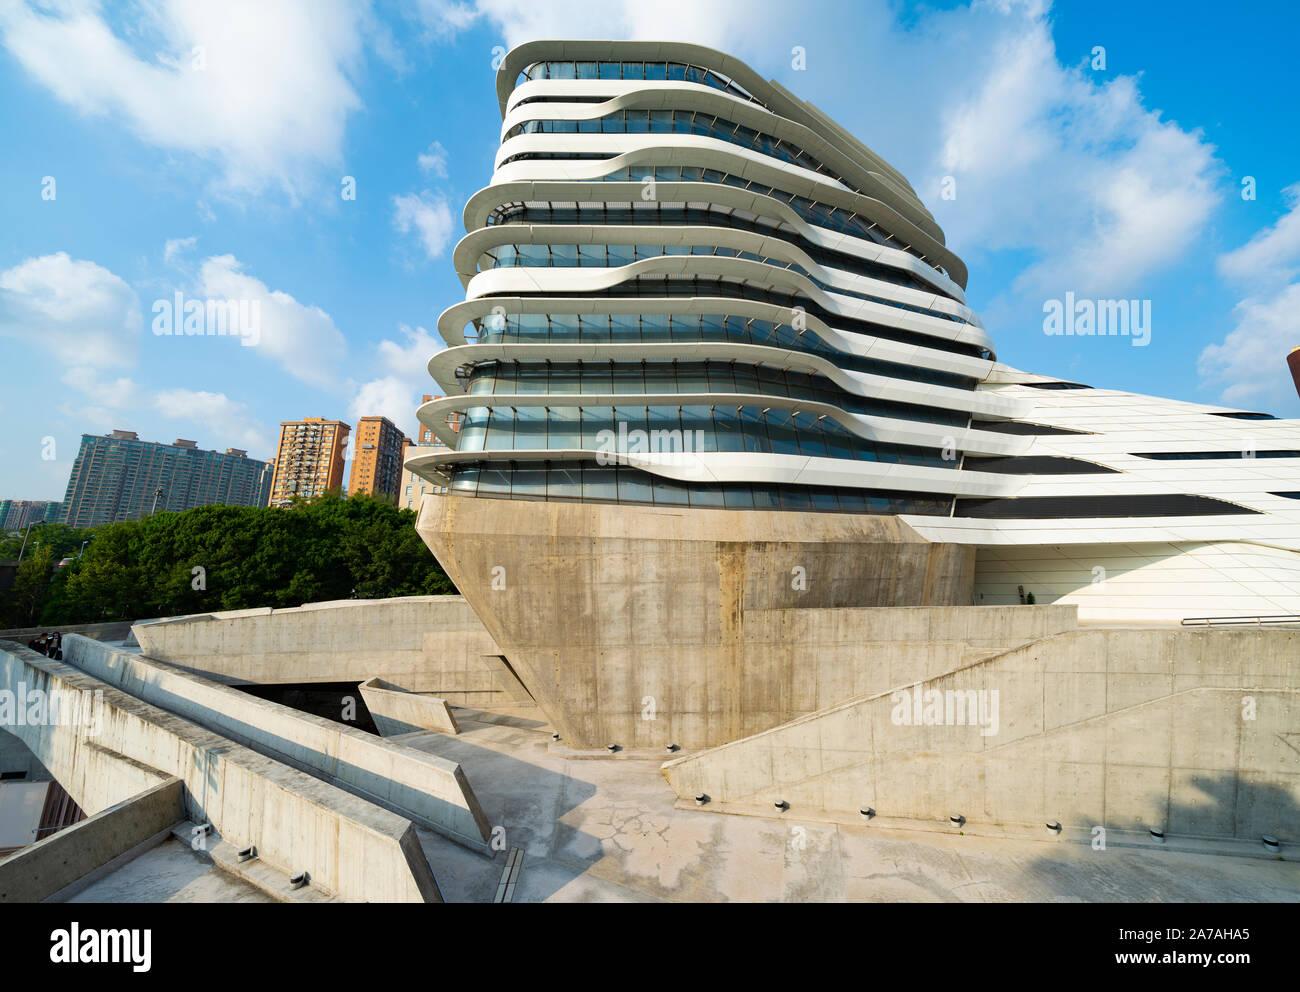 modern architecture of PolyU School of Design Jockey Club Innovation Tower at Hong Kong Polytechnic University, Hong Kong. Architect Zaha Hadid Stock Photo